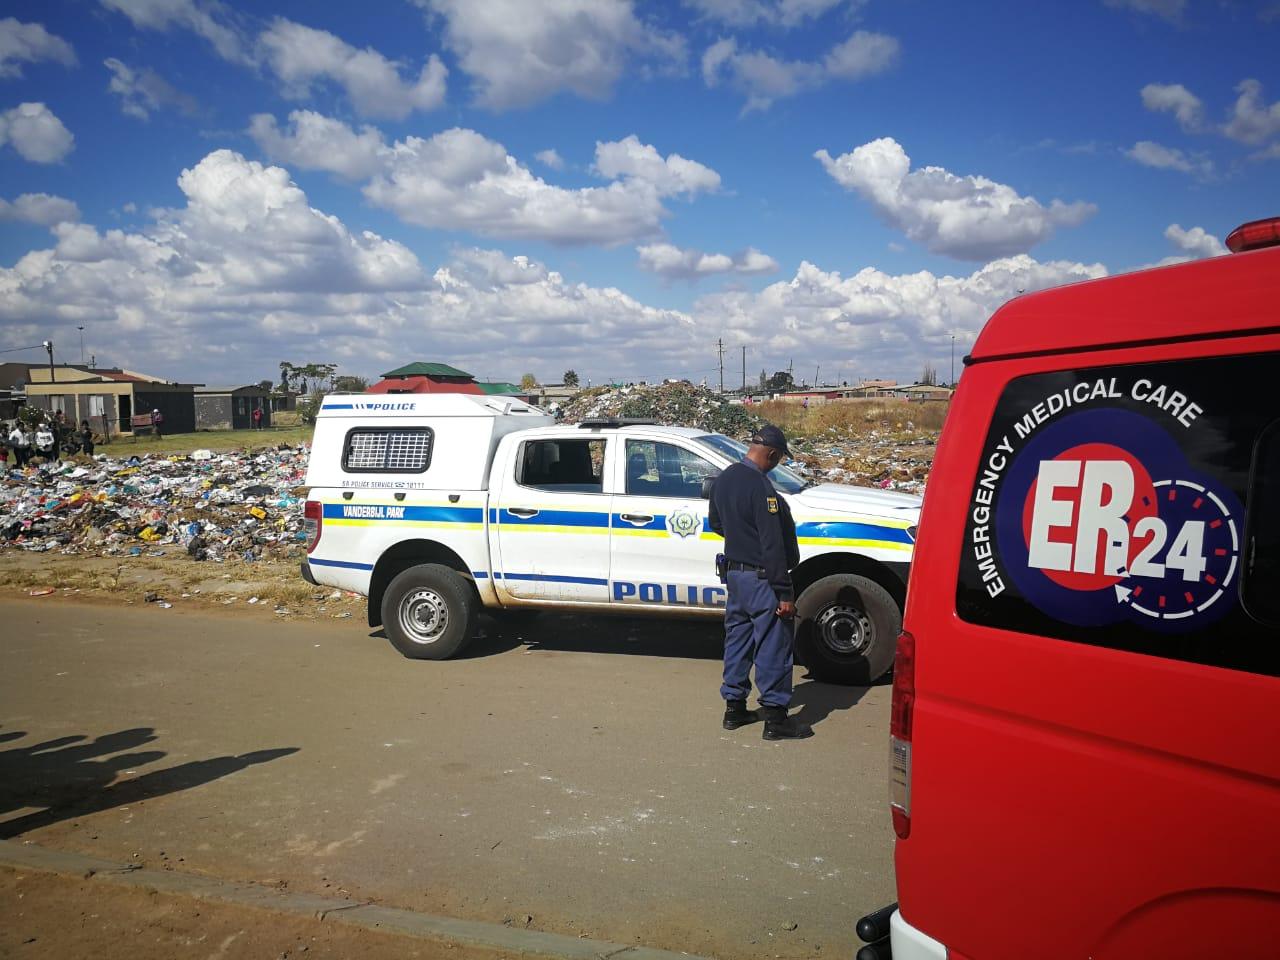 A Body of foetus found in a rubbish dump in Muvhango, Bophelong